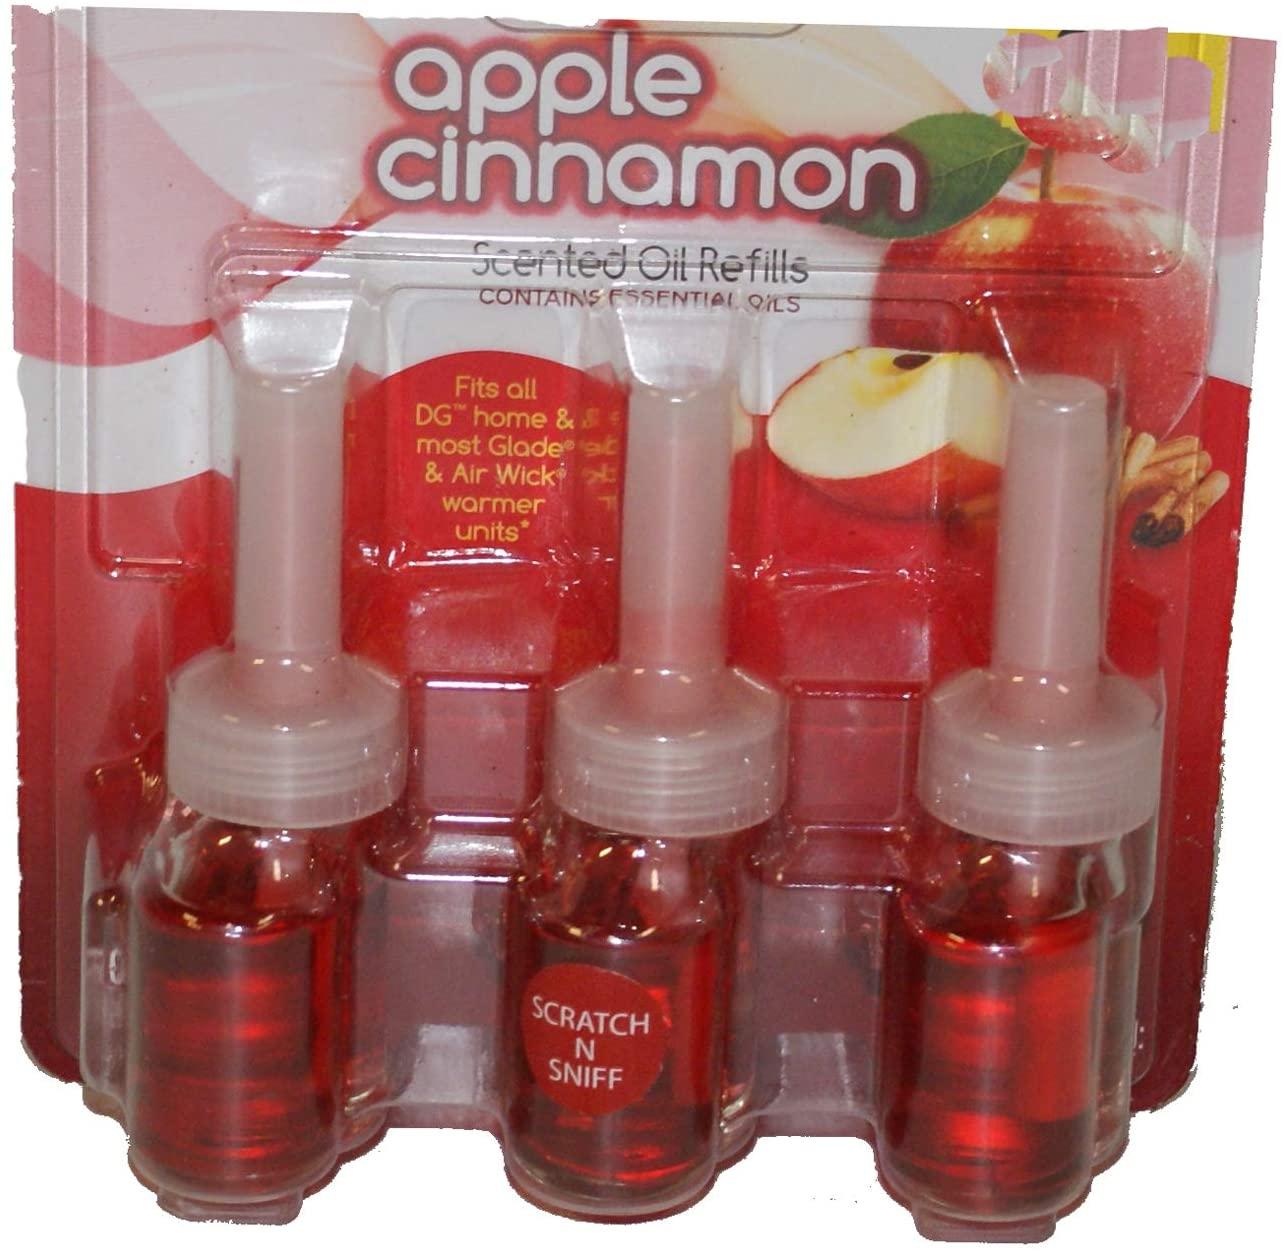 Apple Cinnamon Scented Oil Refills 3